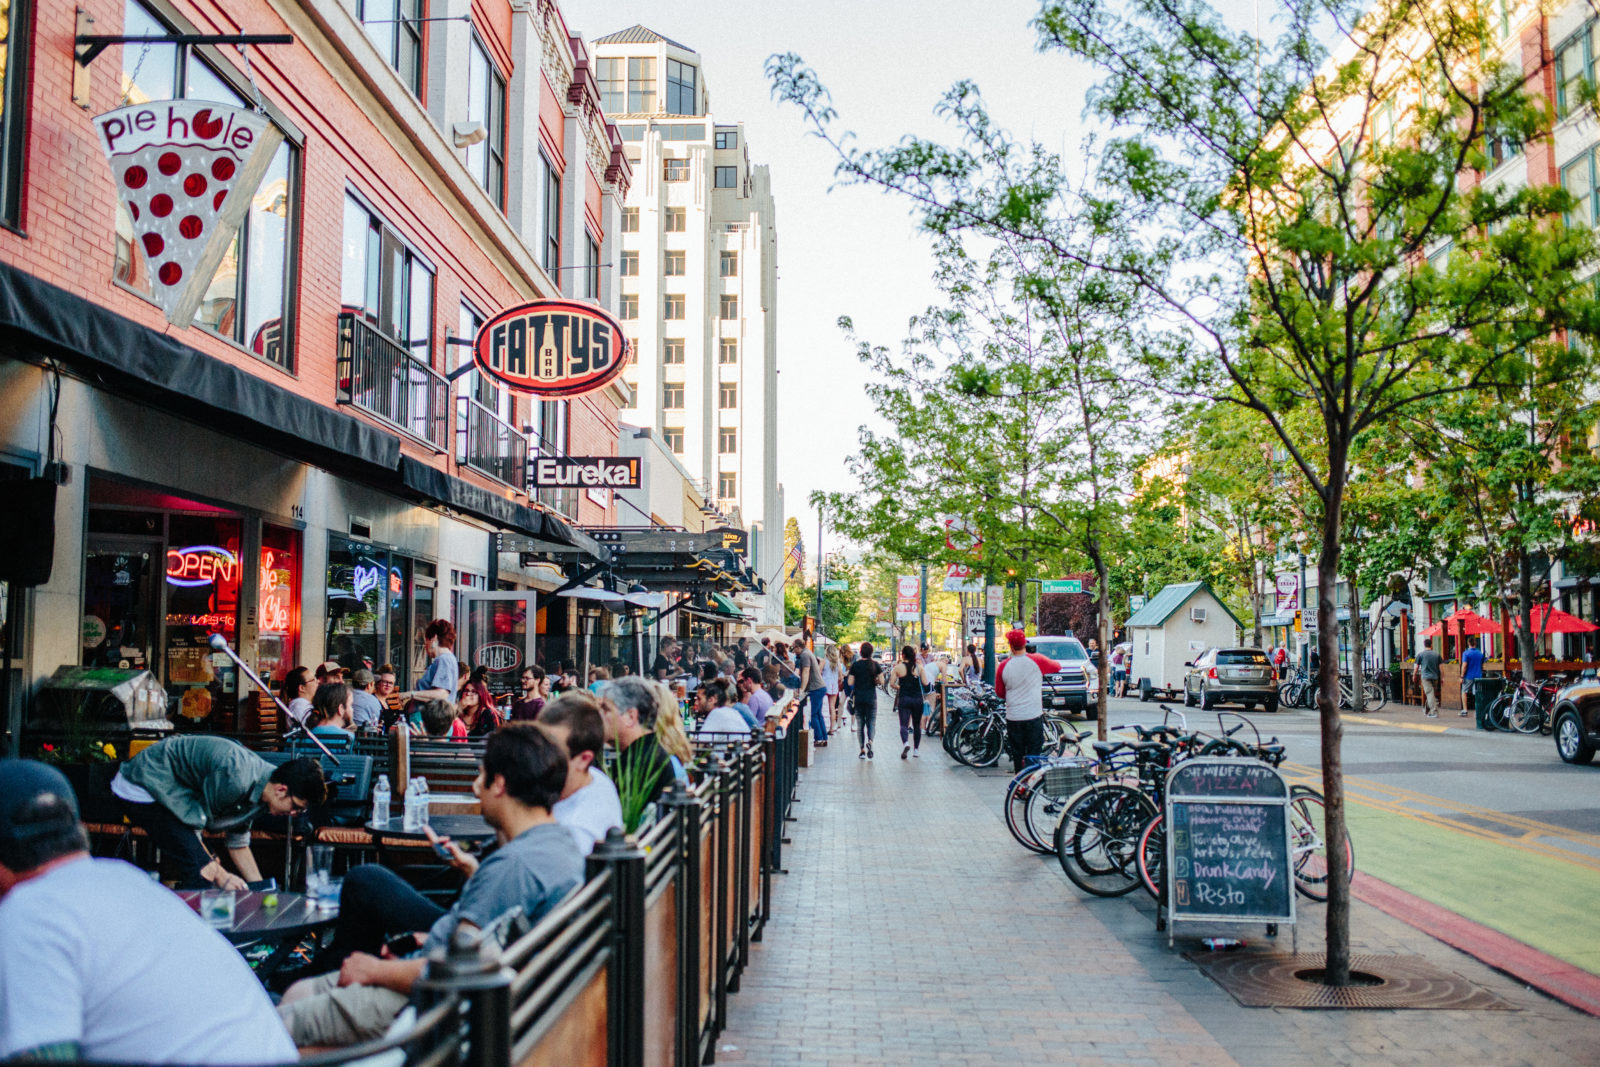 Downtown-Boise-Idaho.jpg?mtime=20180308084823#asset:100800